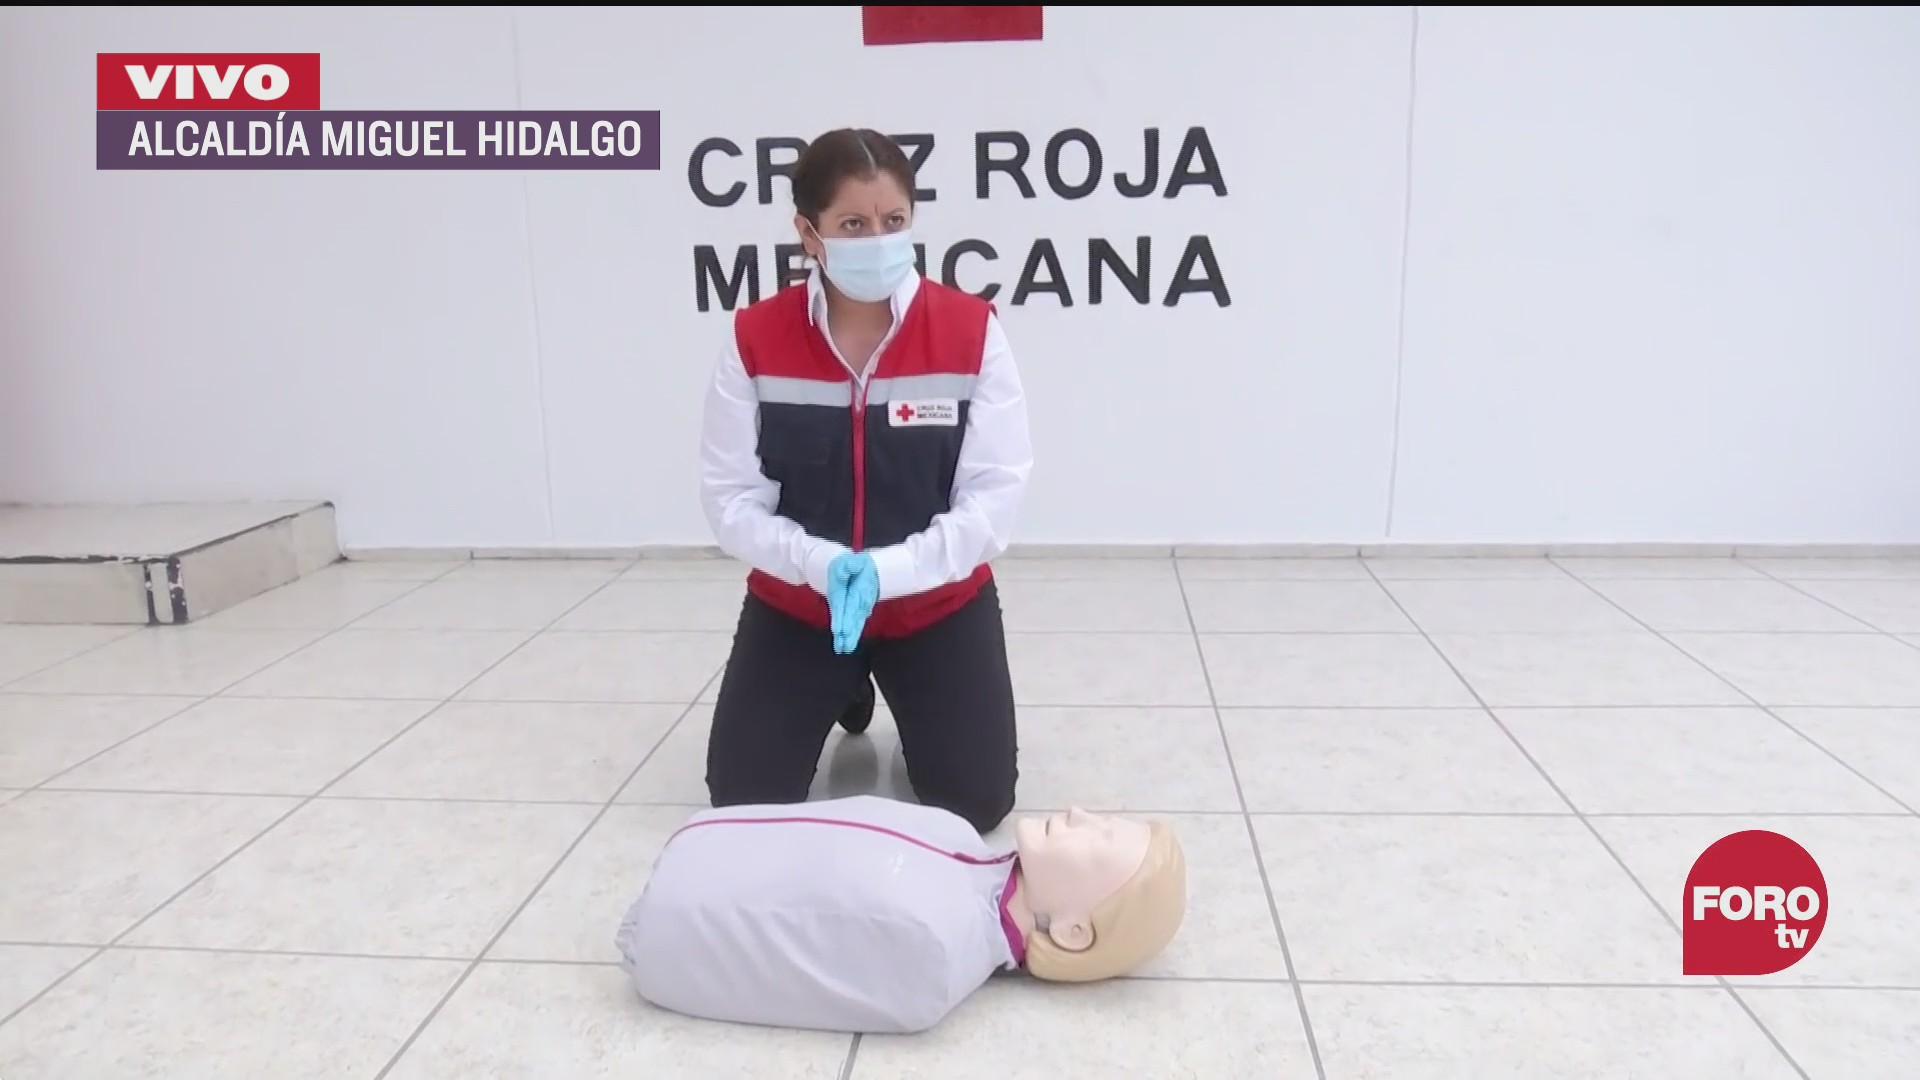 cruz roja mexicana ensena primeros auxilios basicos